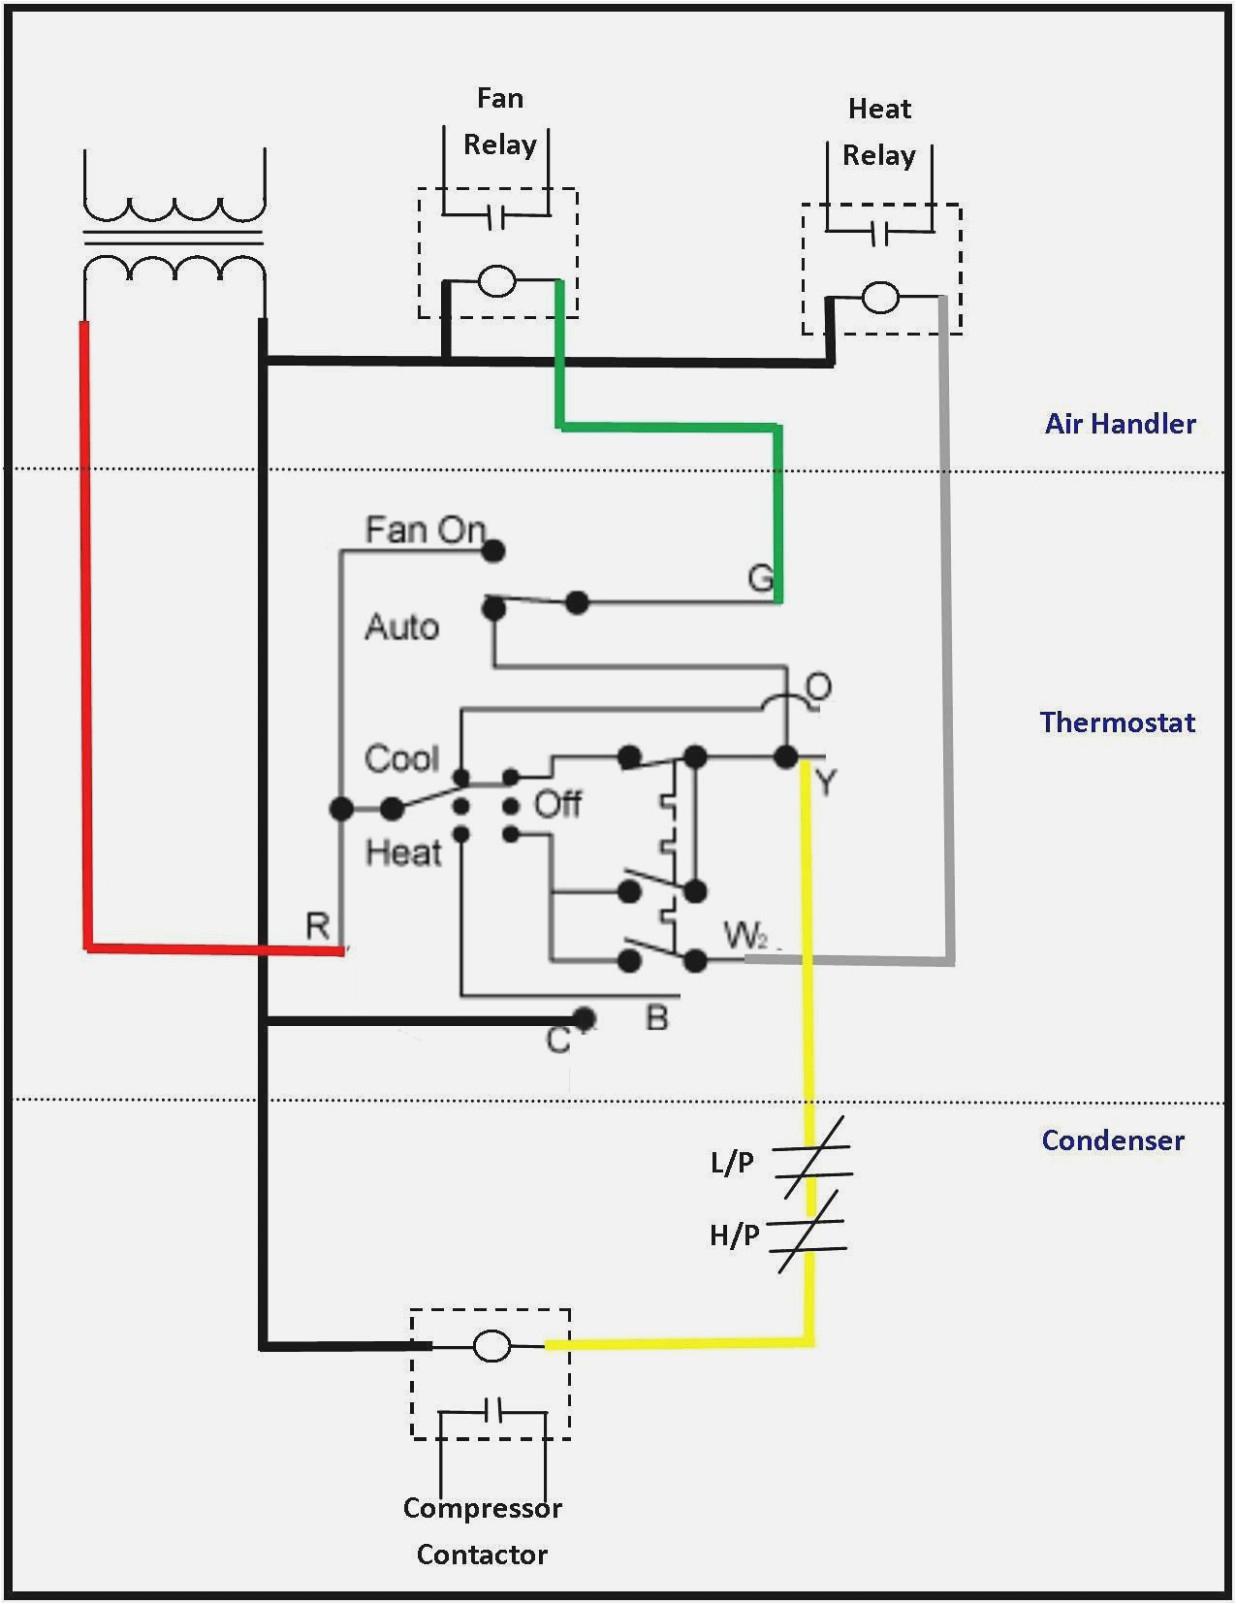 oil fired furnace wiring diagram wiring diagram oil furnace jpg